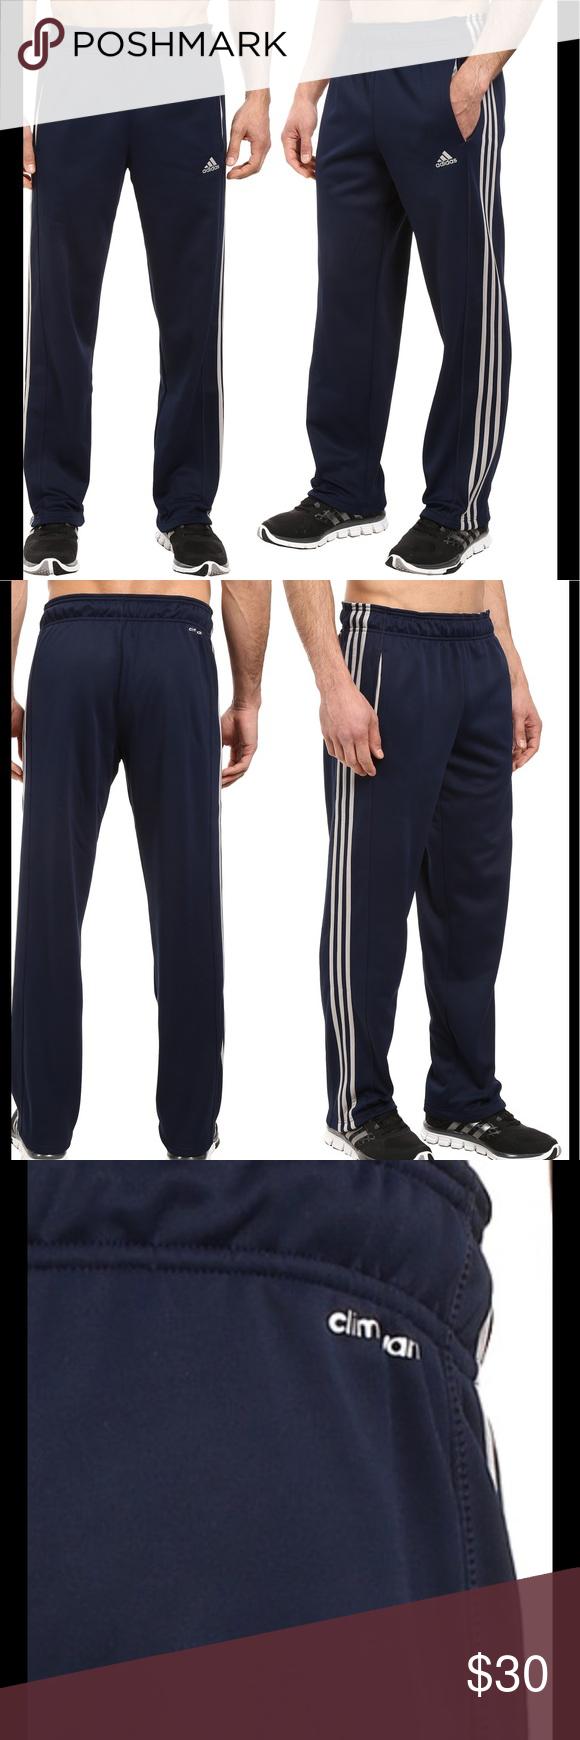 SOLD 😘. ADIDAS Climawarm Tech Fleece Pants XXL NWT